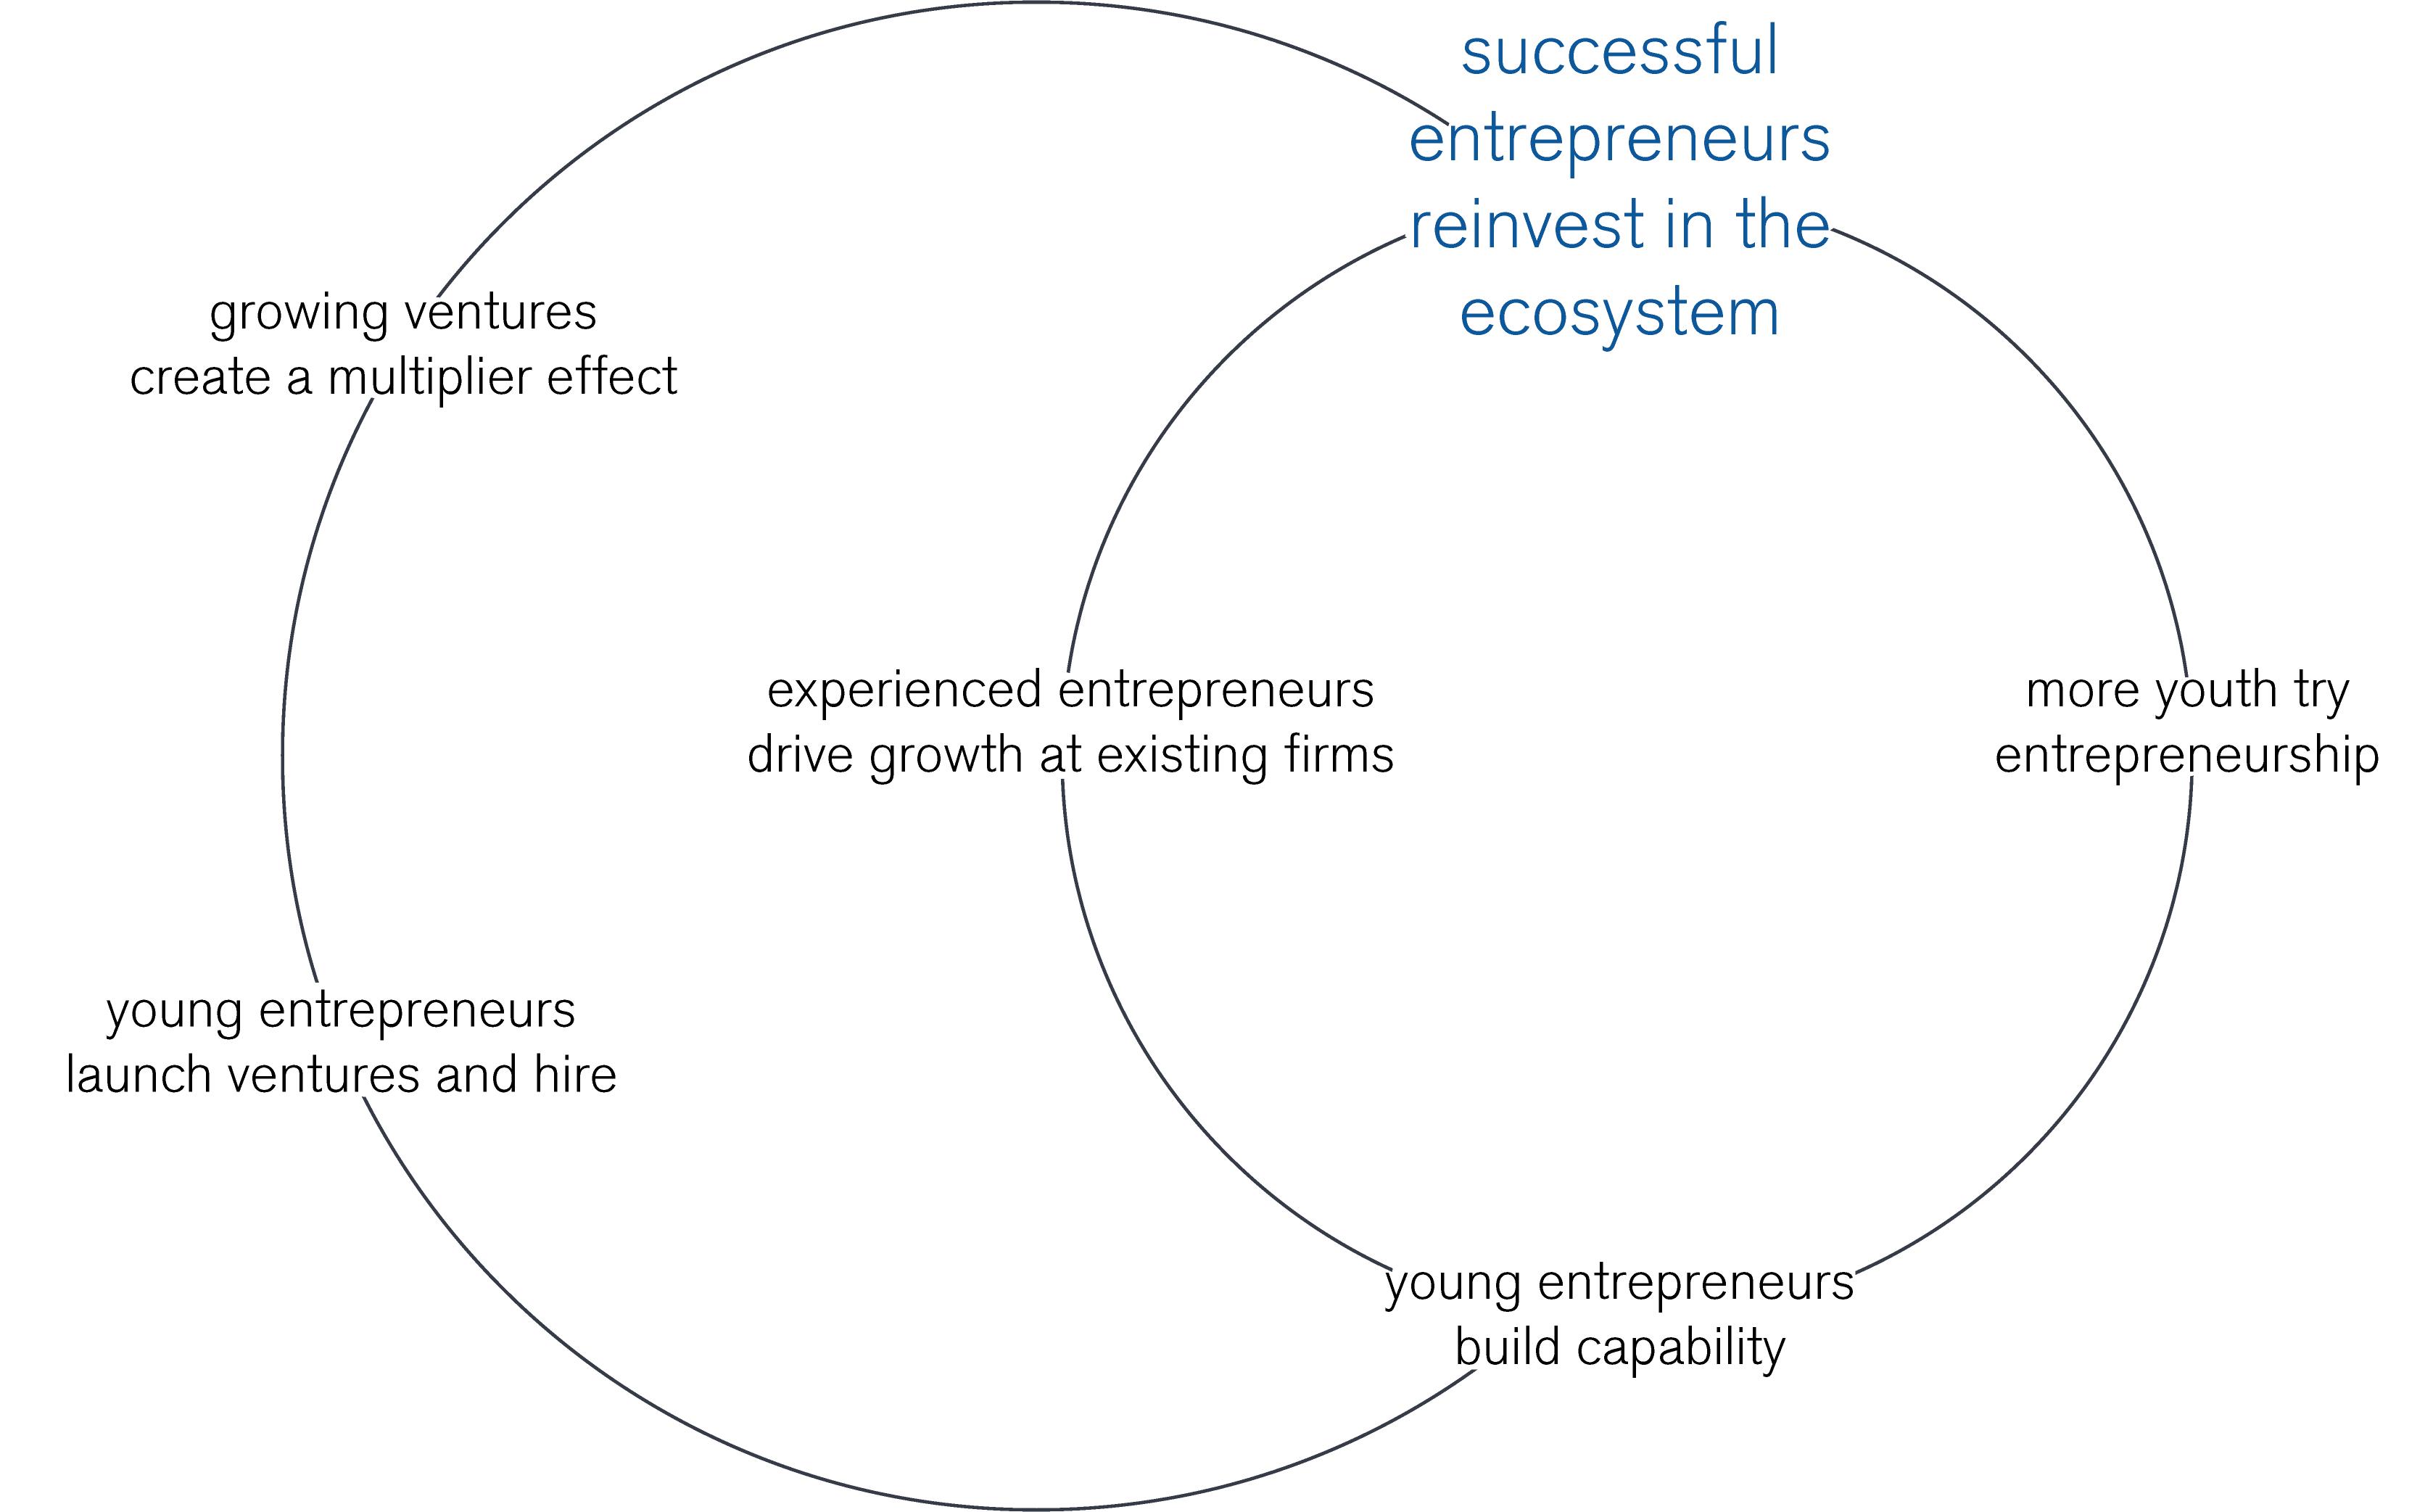 entrepreneurial capability + job creation